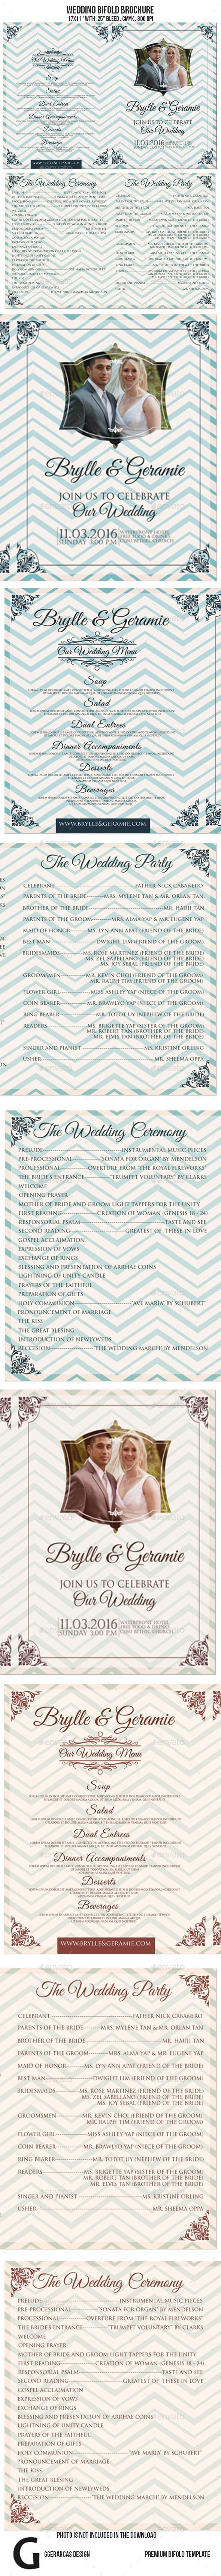 GraphicRiver Wedding Bi fold Brochure 9575825